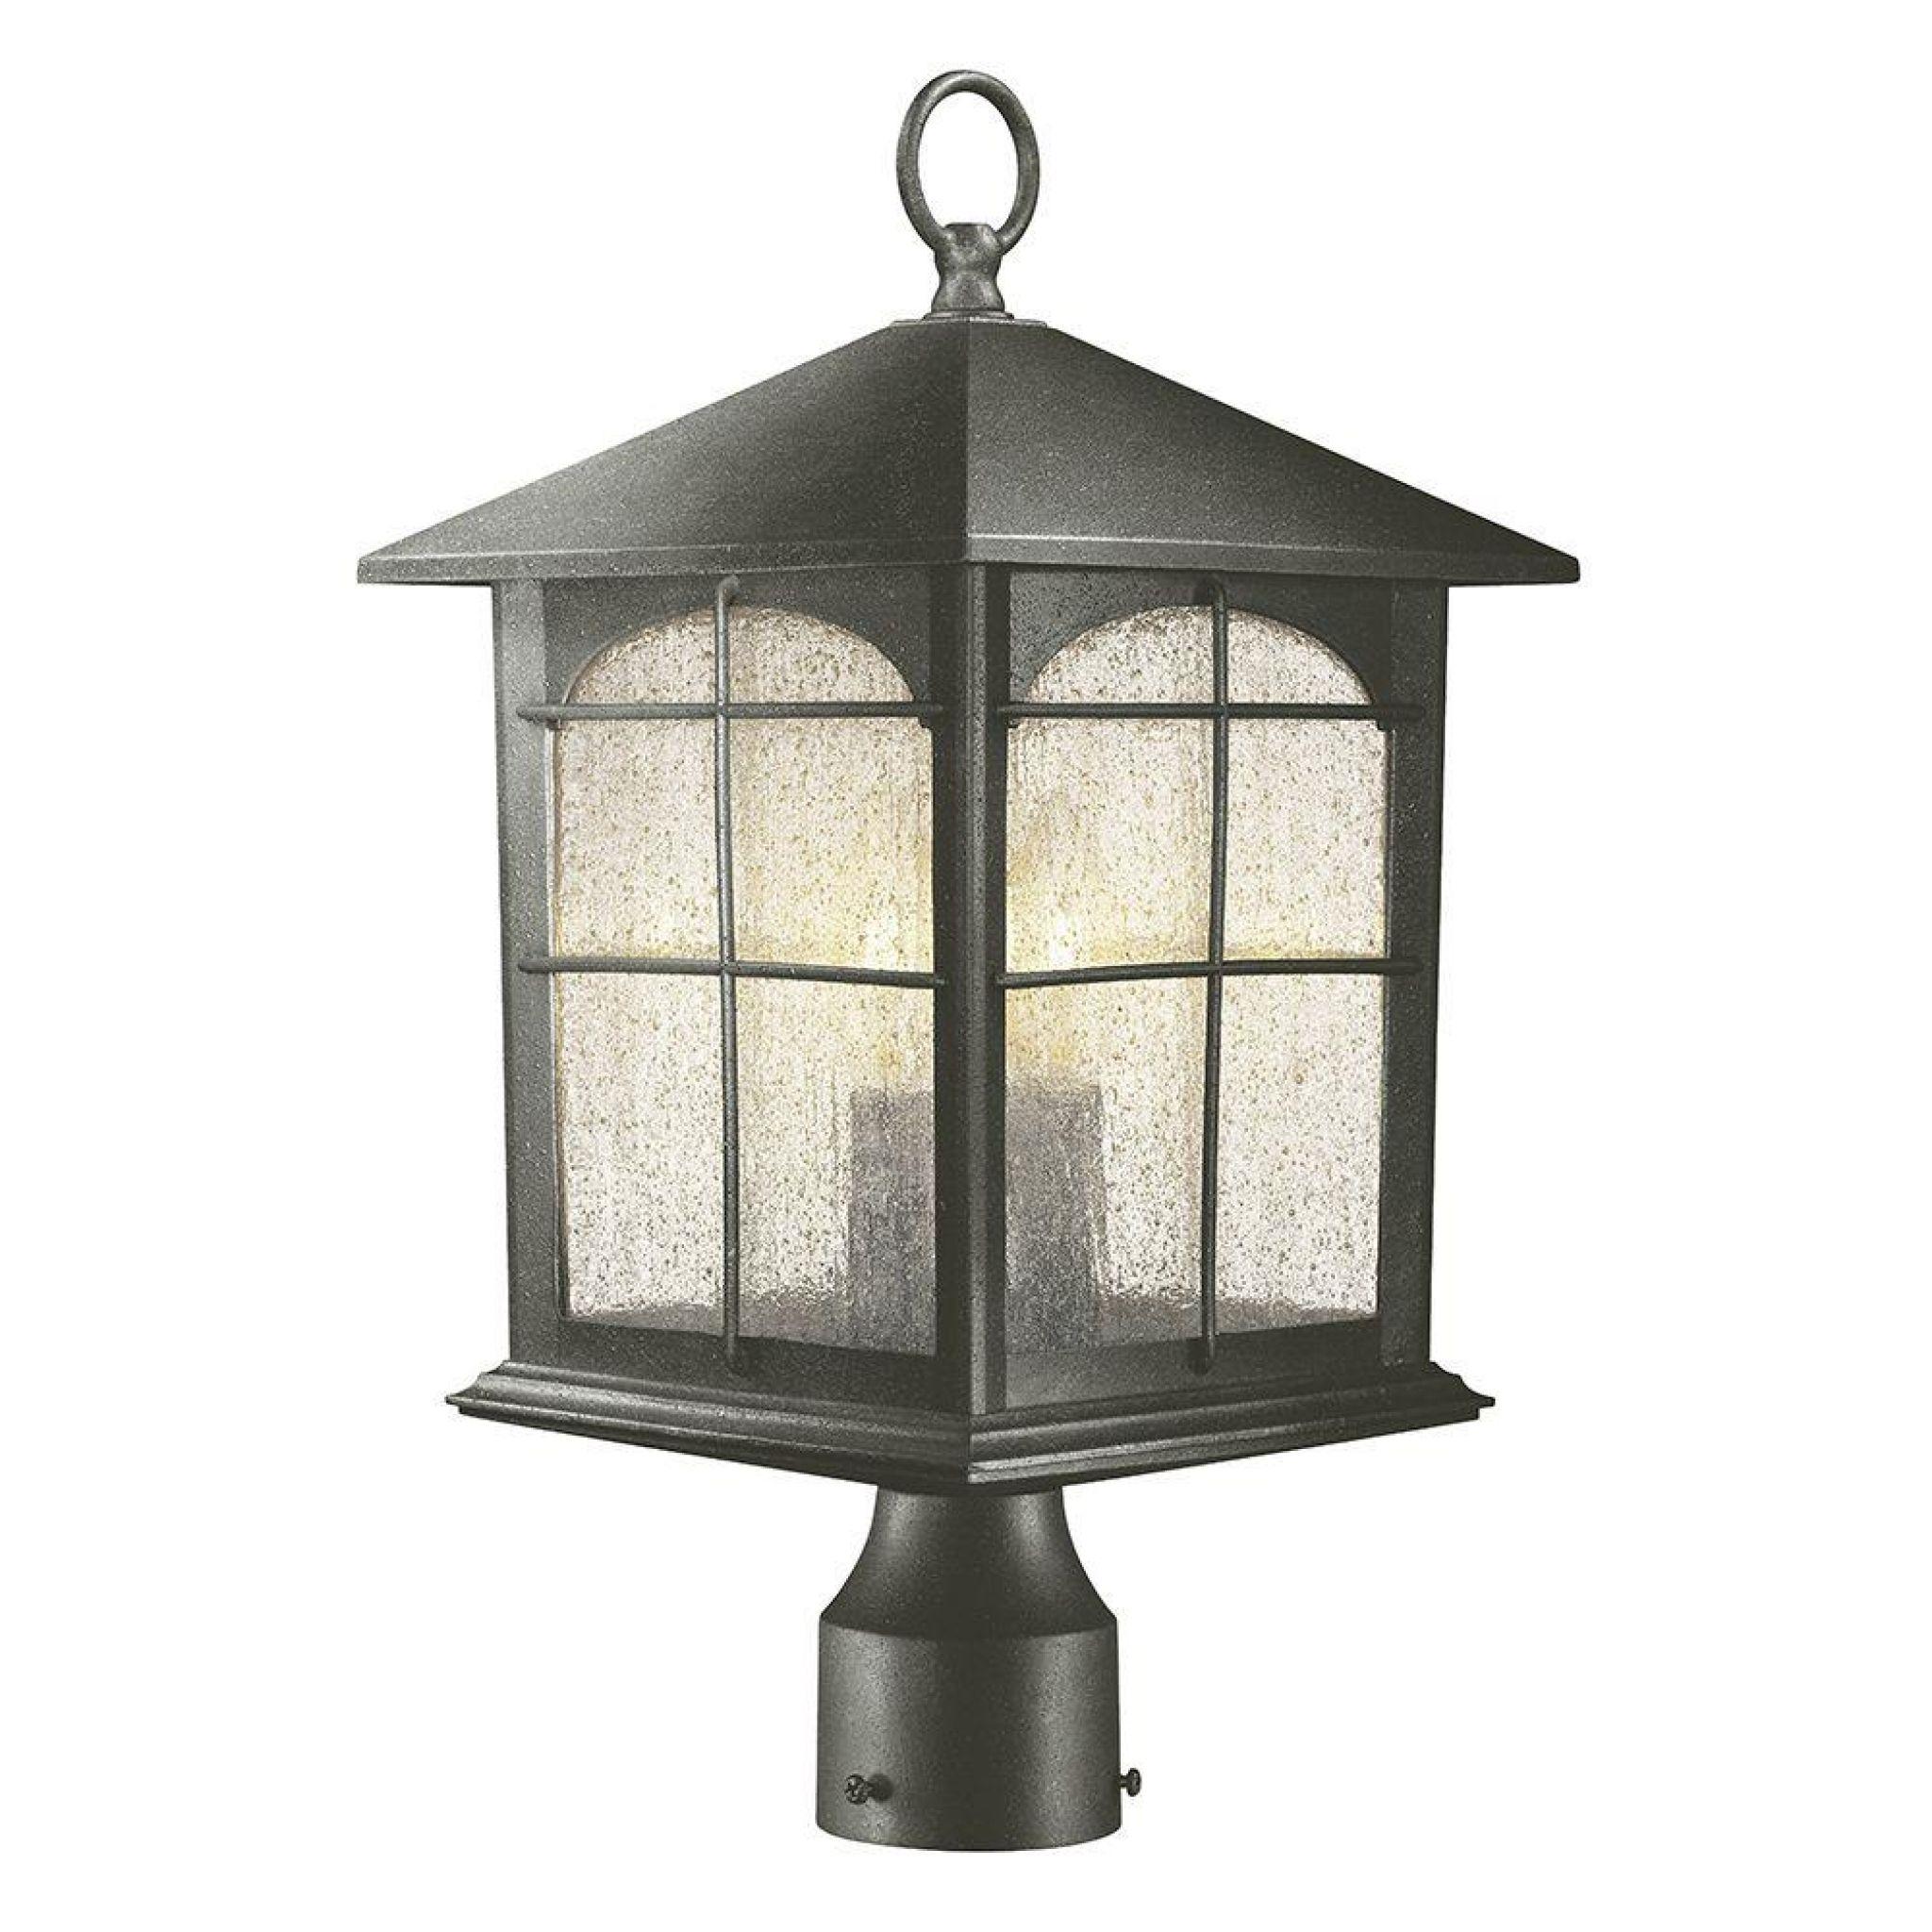 home depot outdoor post lighting - best interior paint brand Check ...